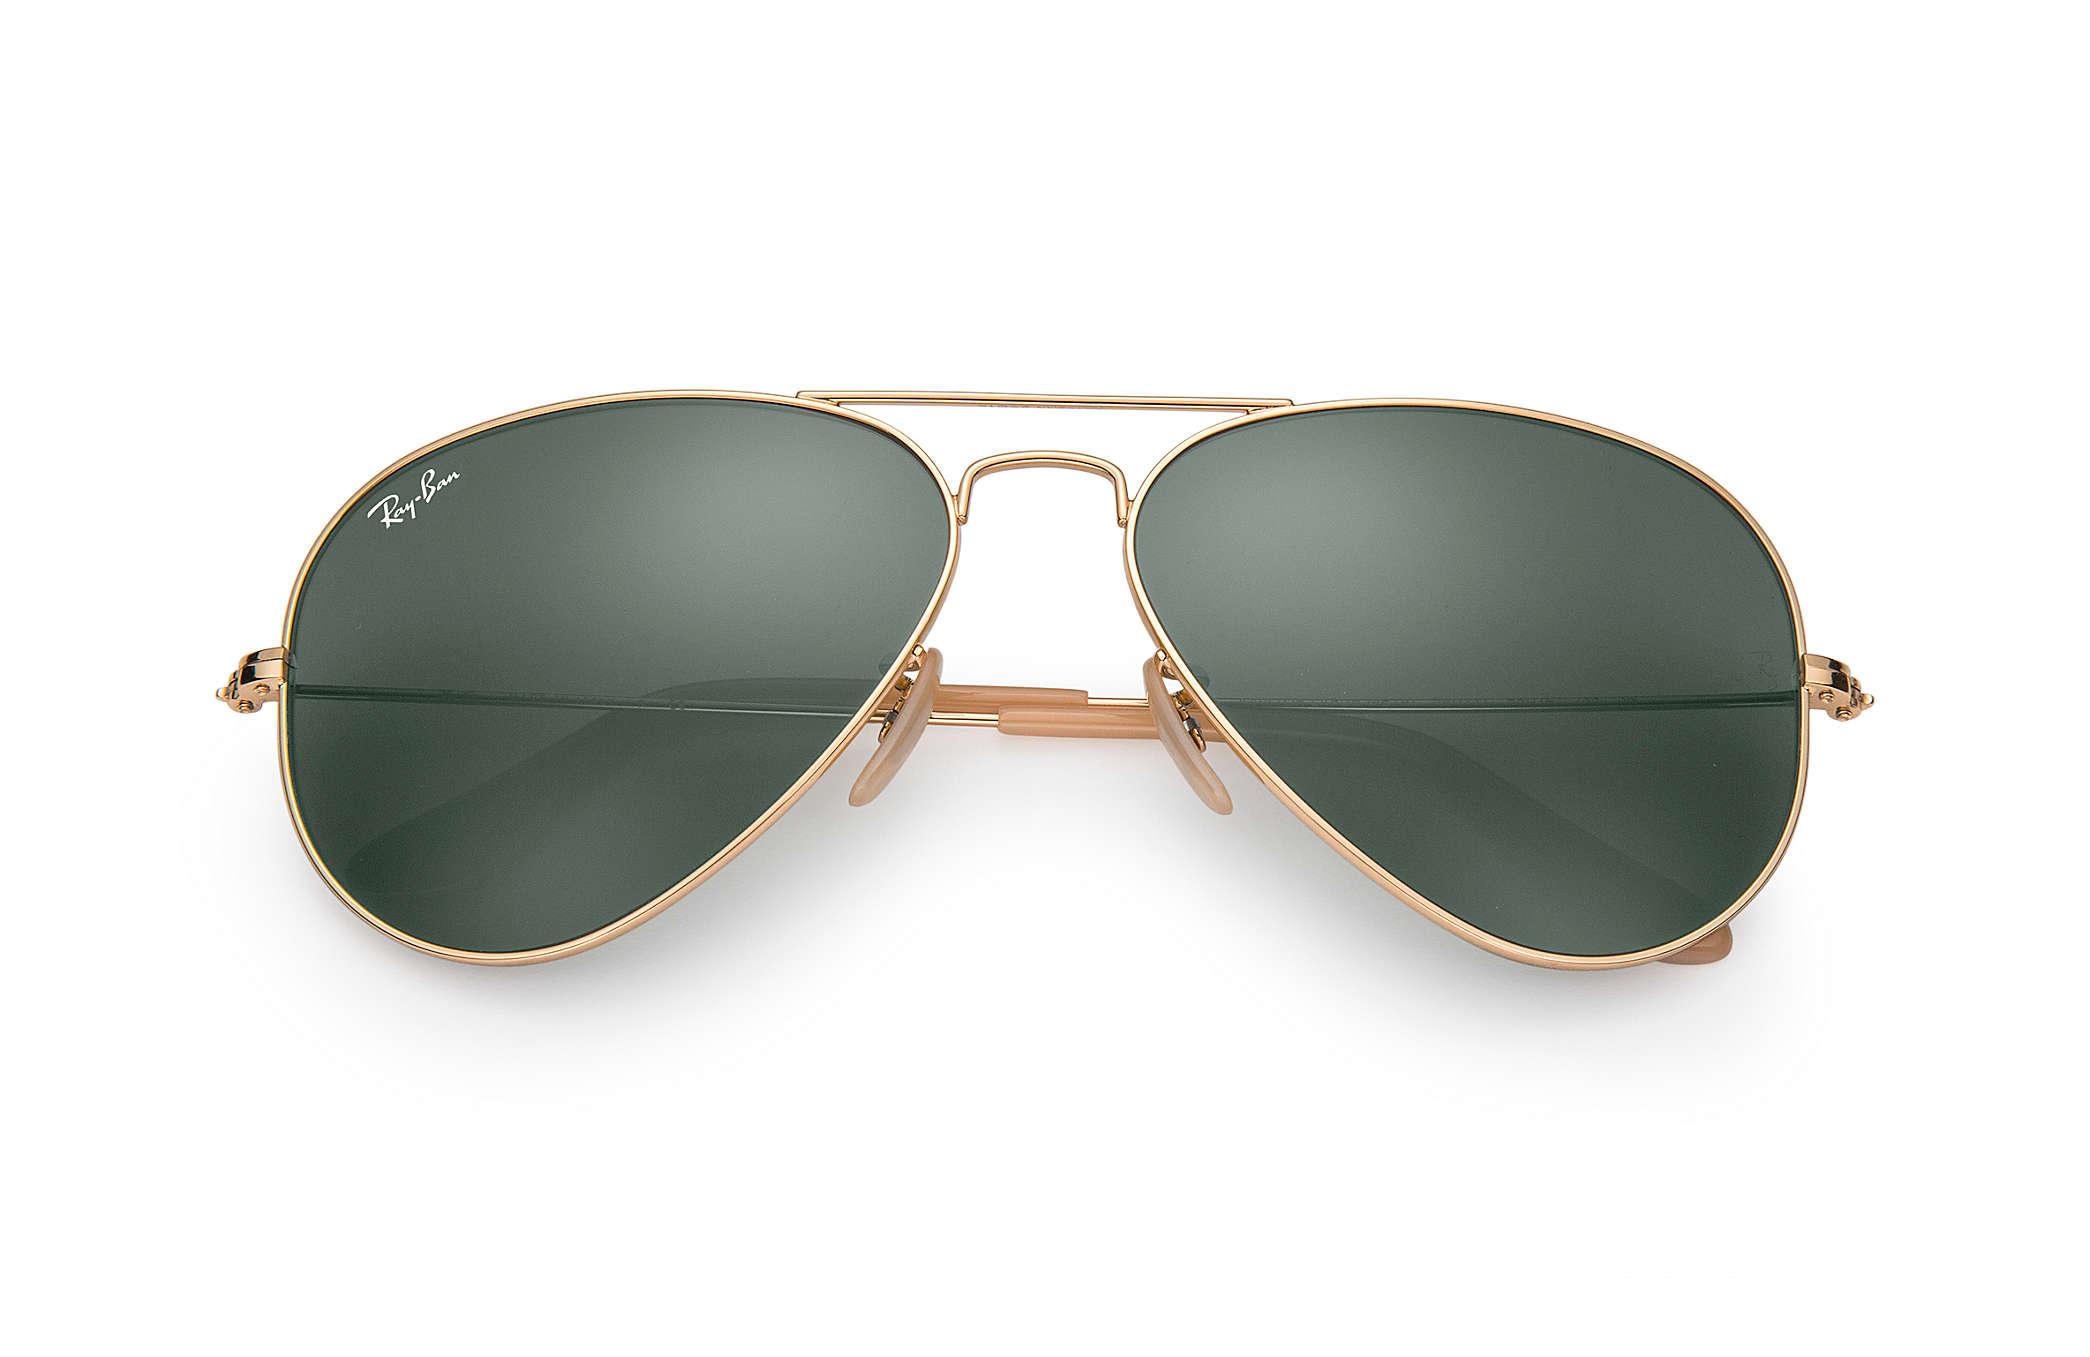 original ray ban aviator sunglasses price in pakistan